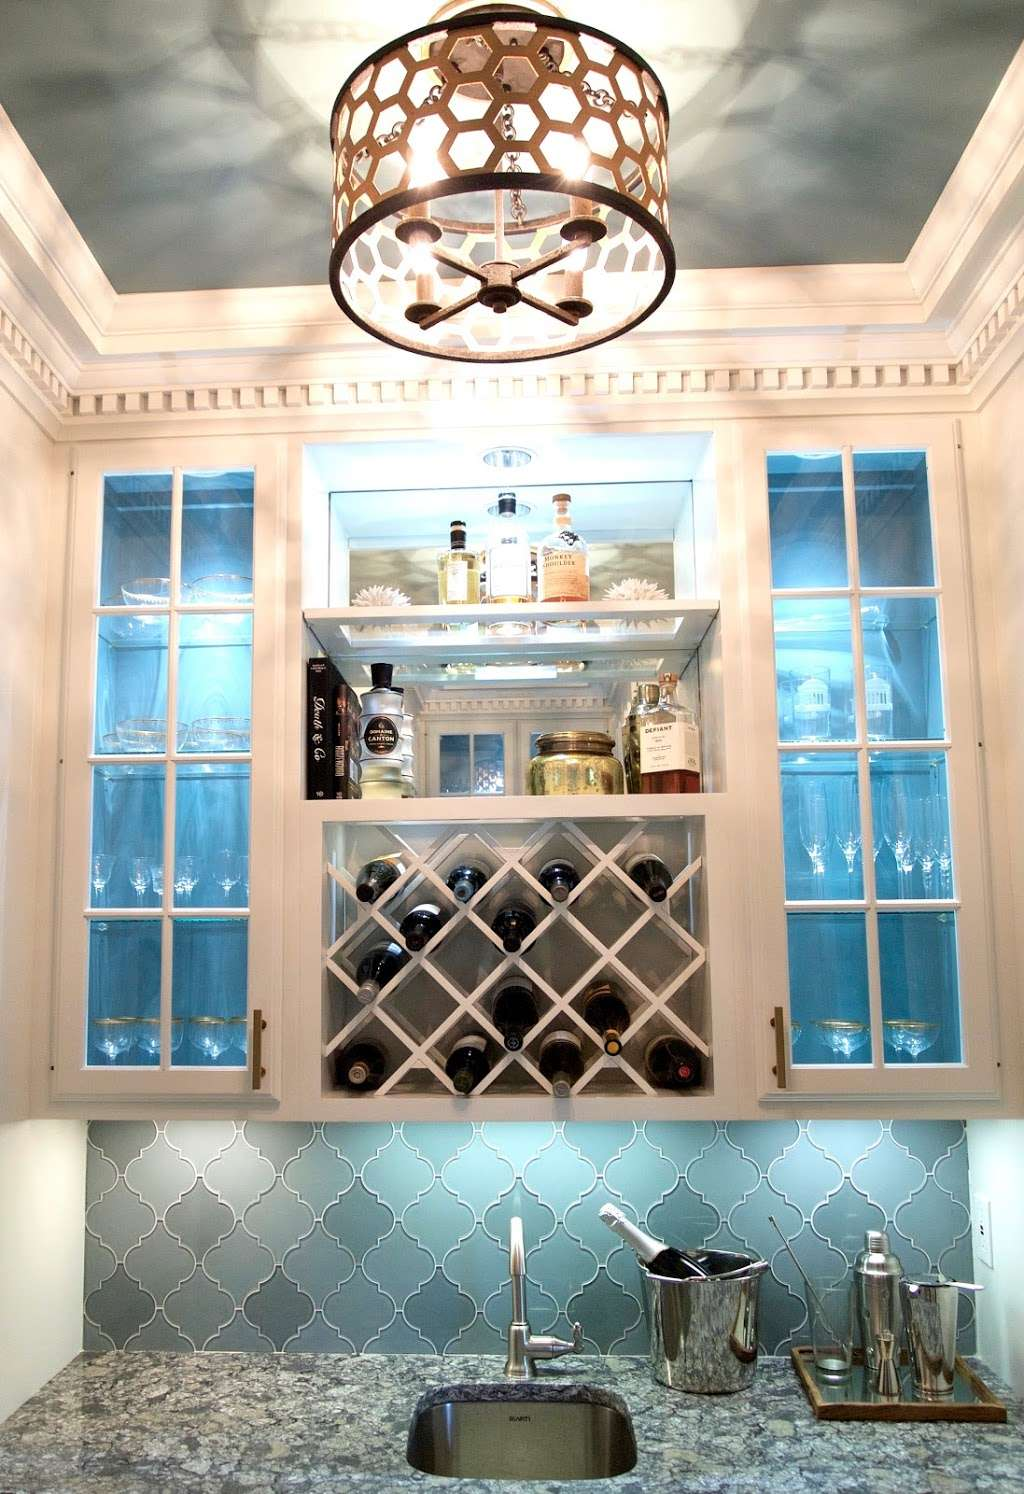 LoveYourRoom - home goods store  | Photo 8 of 10 | Address: 4709 Glenwood Cir, Emmaus, PA 18049, USA | Phone: (610) 573-0642